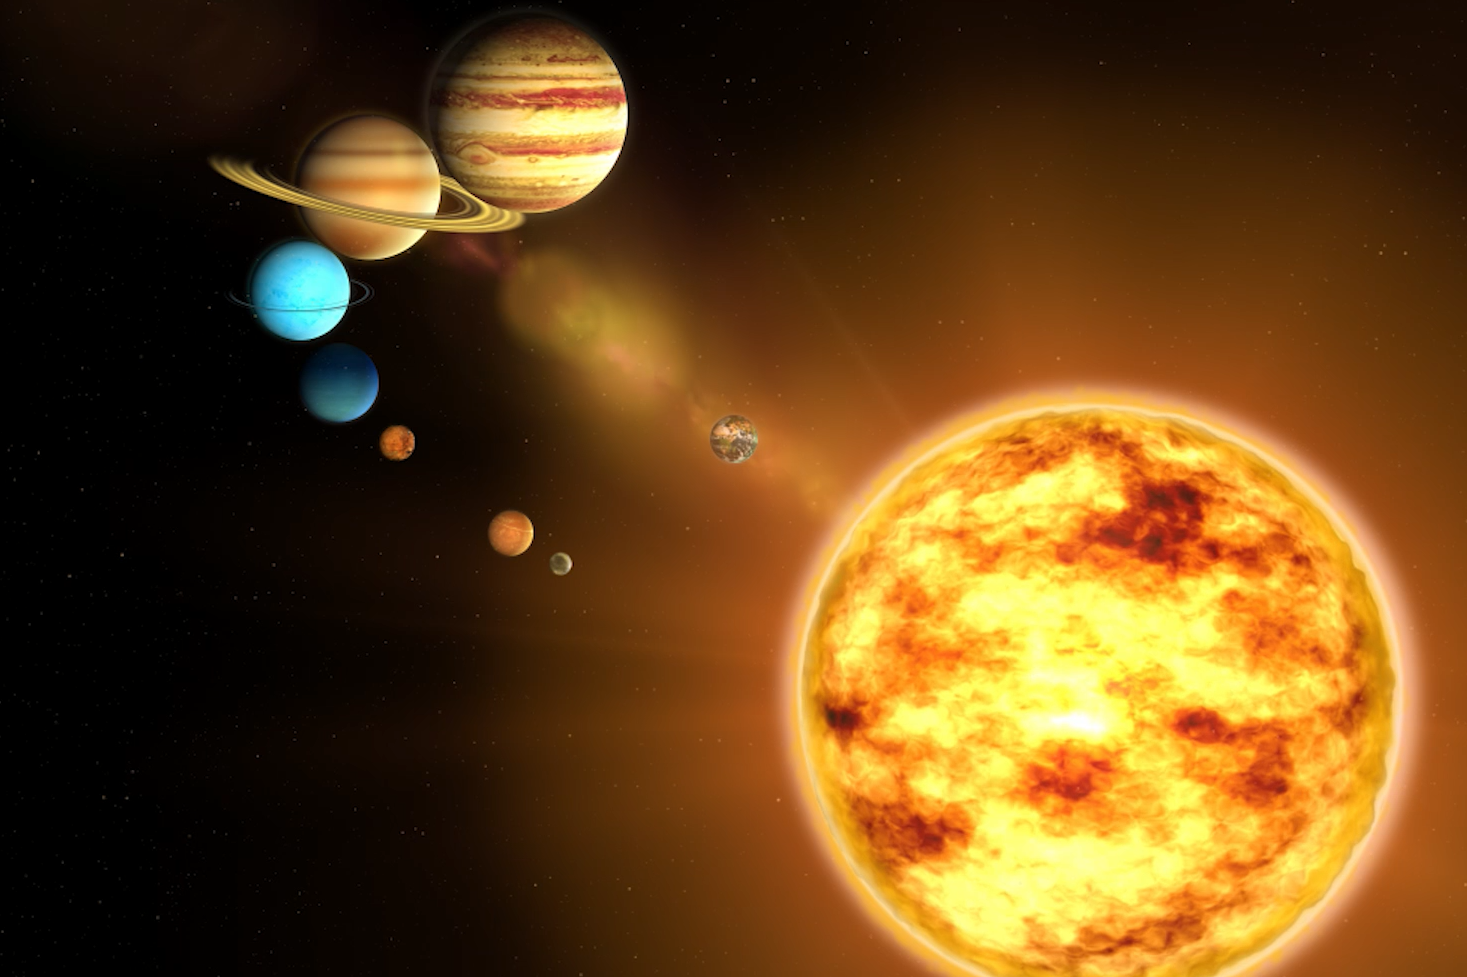 дизайне картинка с солнцем и планетами того, начале мая